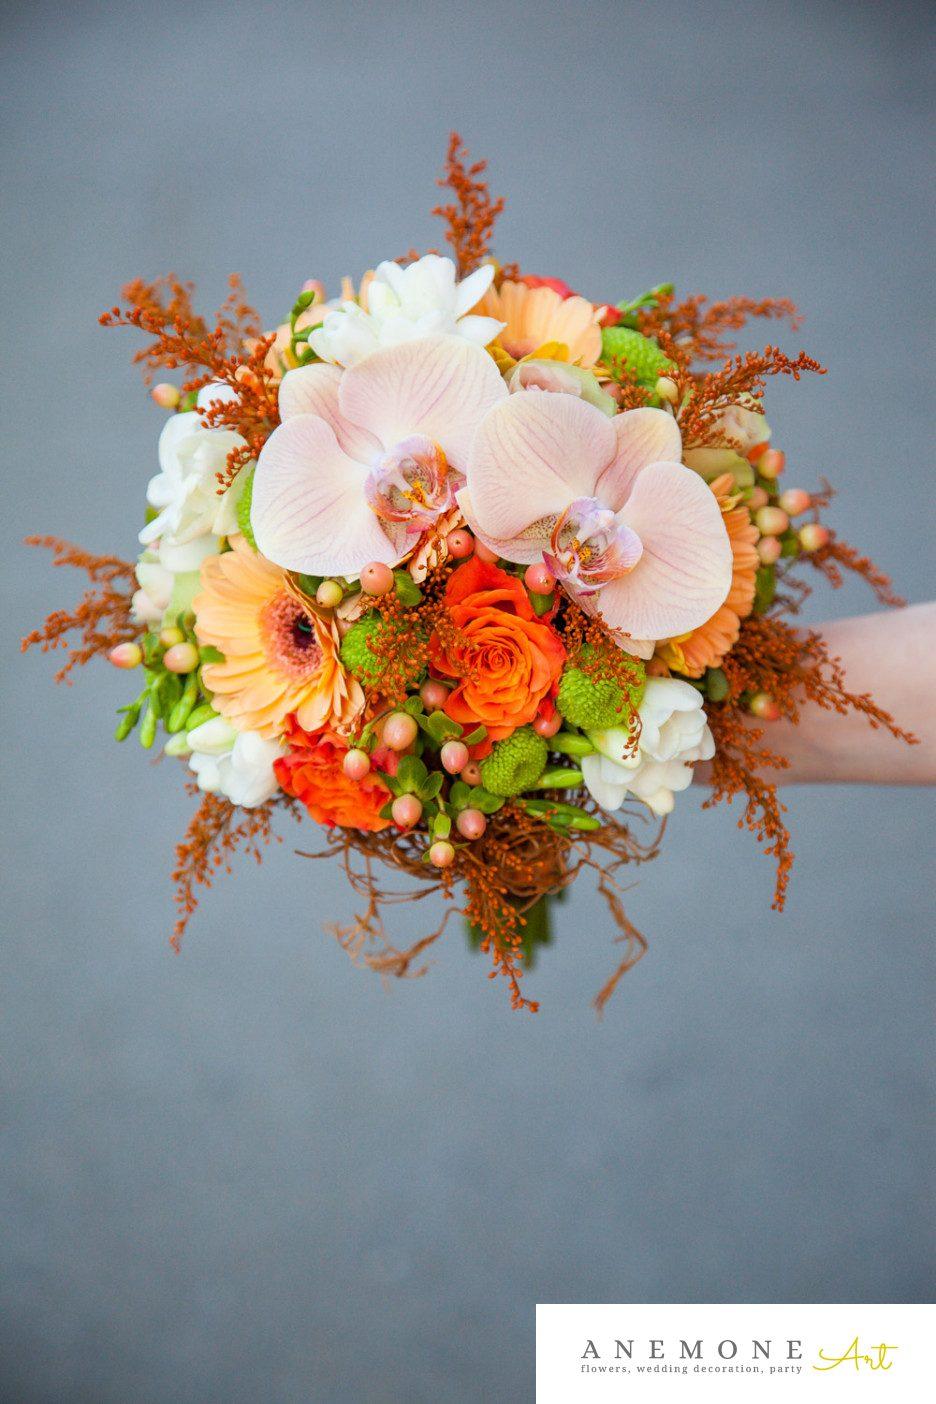 Poza, foto cu Flori de nunta buchet mireasa, maro, orhidee, phalaenopsis, portocaliu, rustic in Arad, Timisoara, Oradea (wedding flowers, bouquets) nunta Arad, Timisoara, Oradea